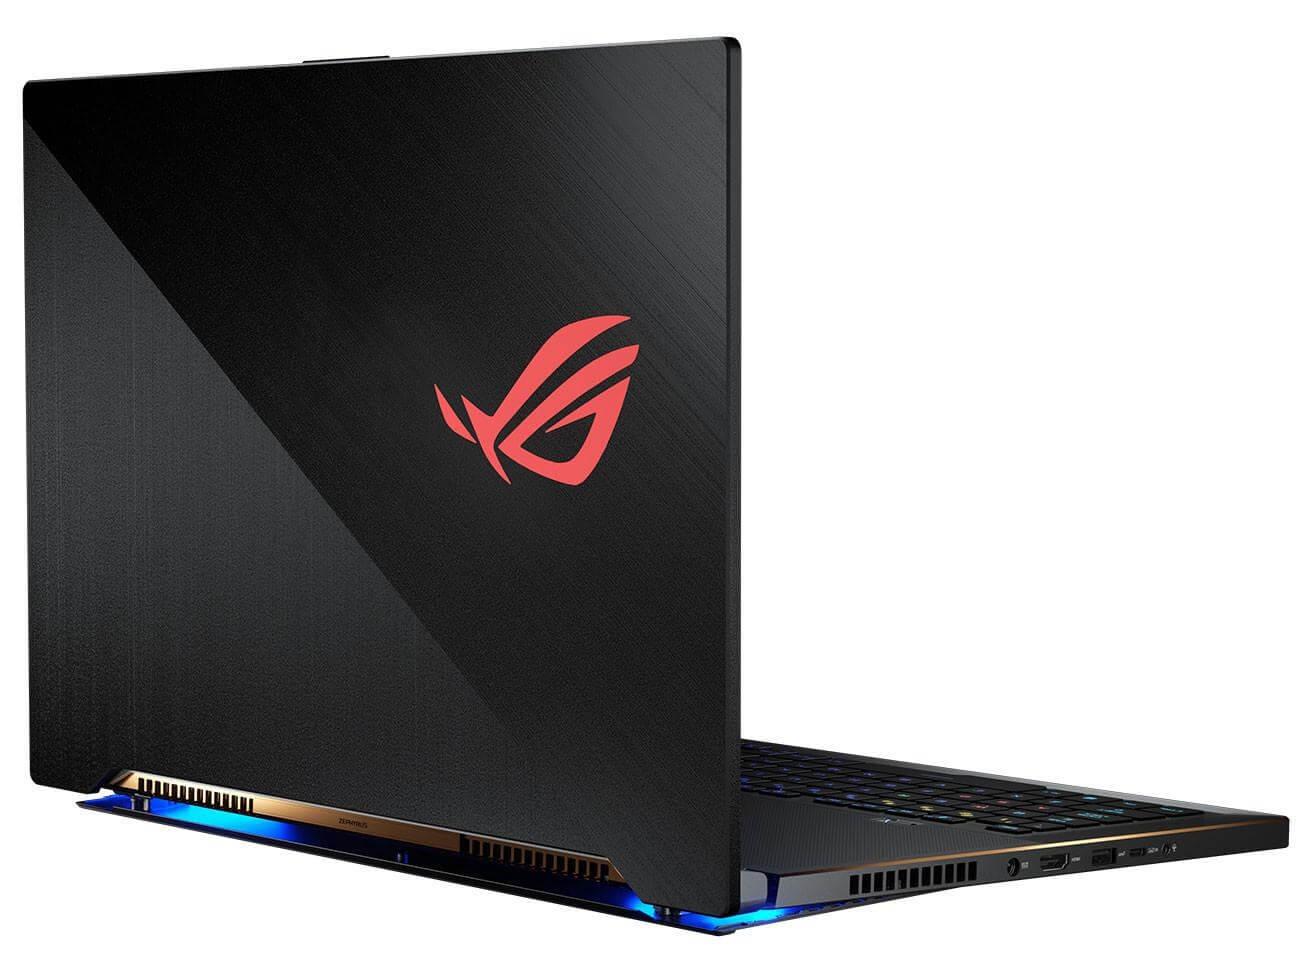 Asus ROG ZEPHYRUS S GX701GV-PS74 SLIM GAMING Core i7-8750HK 512GB 16GB 17.3 inch FHD NVIDIA® GTX 2060 Windows 10